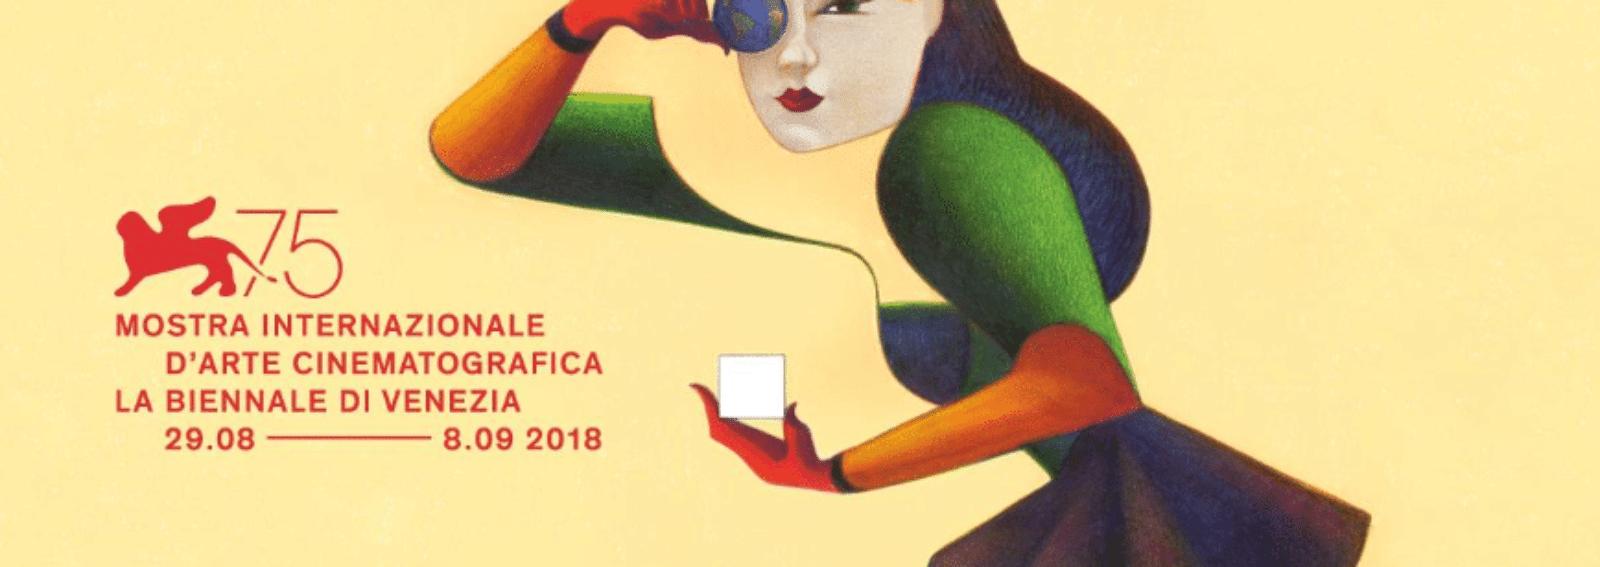 mostra del cinema venezia 2018